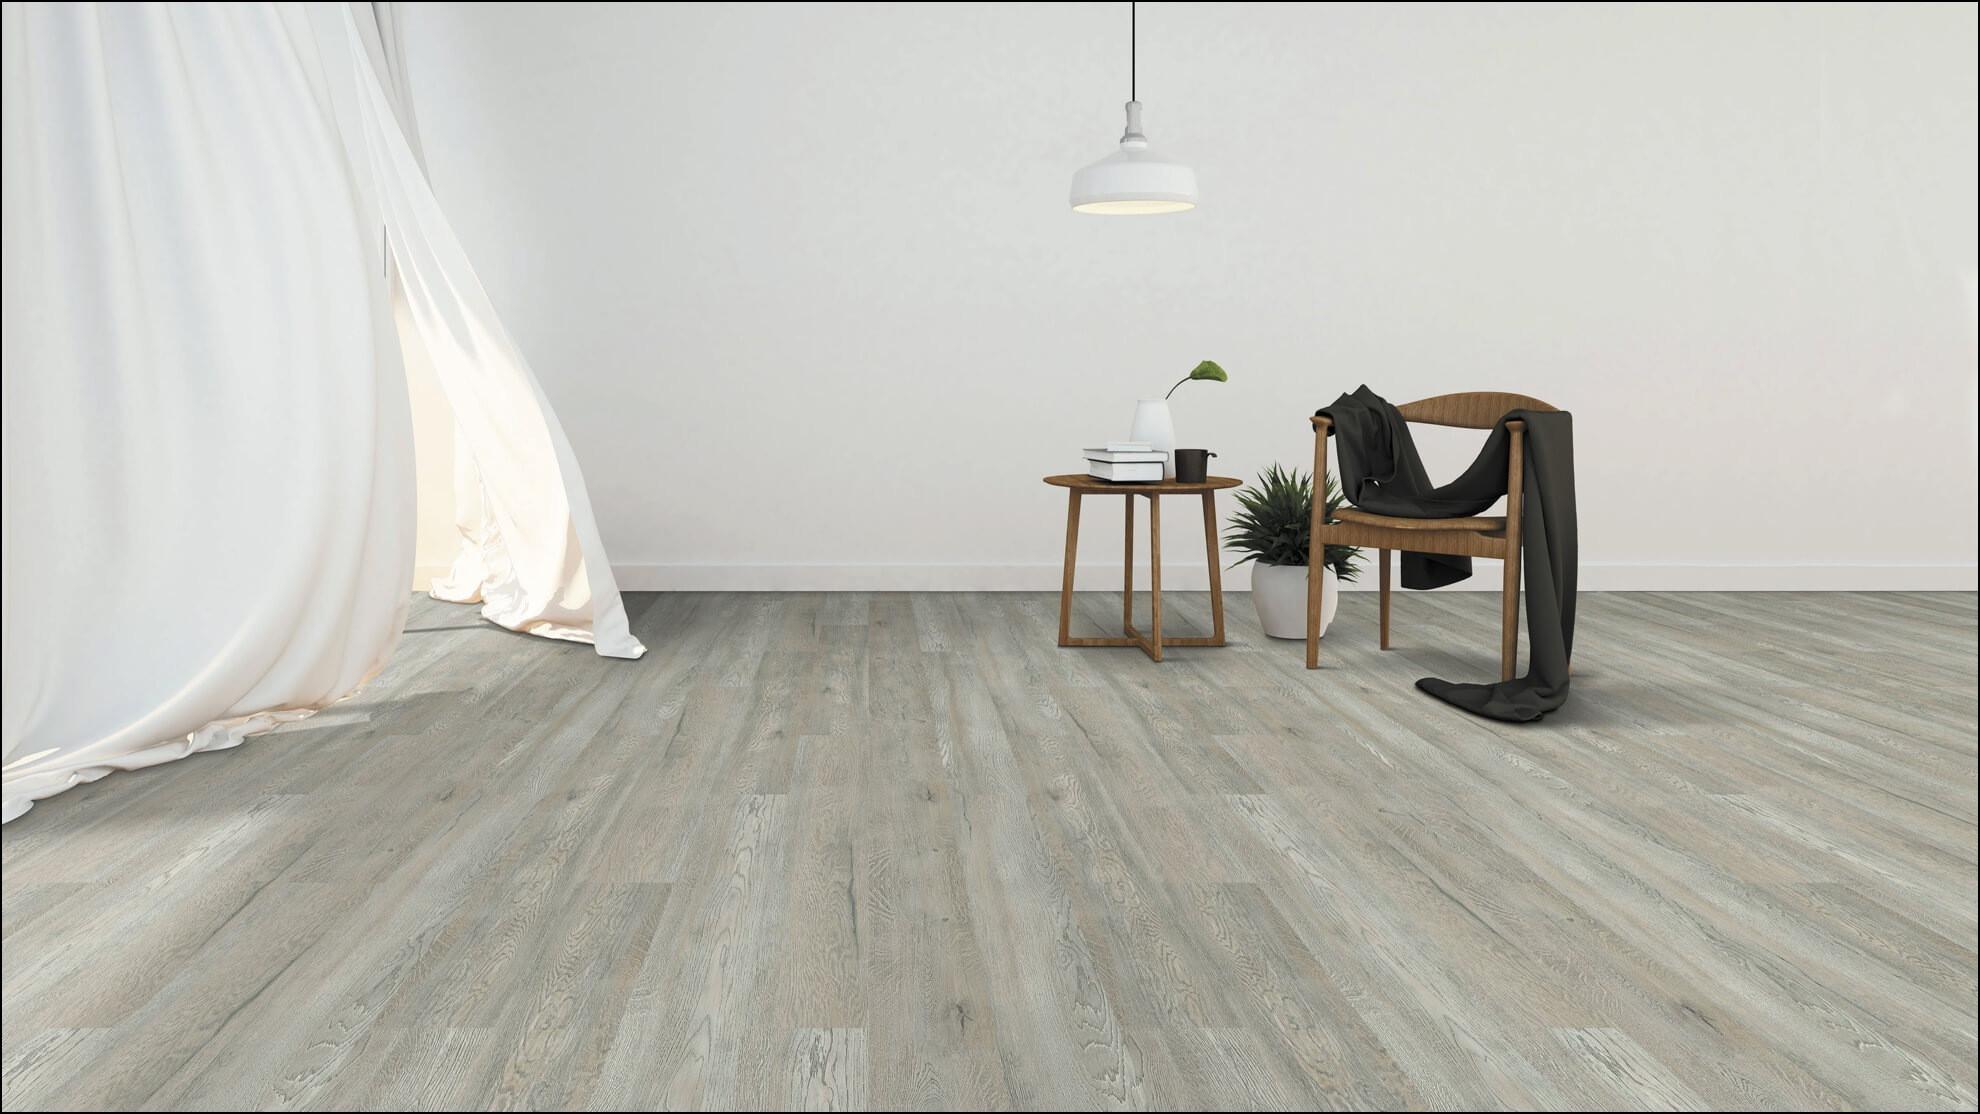 hardwood flooring toronto of hardwood flooring suppliers france flooring ideas for hardwood flooring installation san diego collection earthwerks flooring of hardwood flooring installation san diego